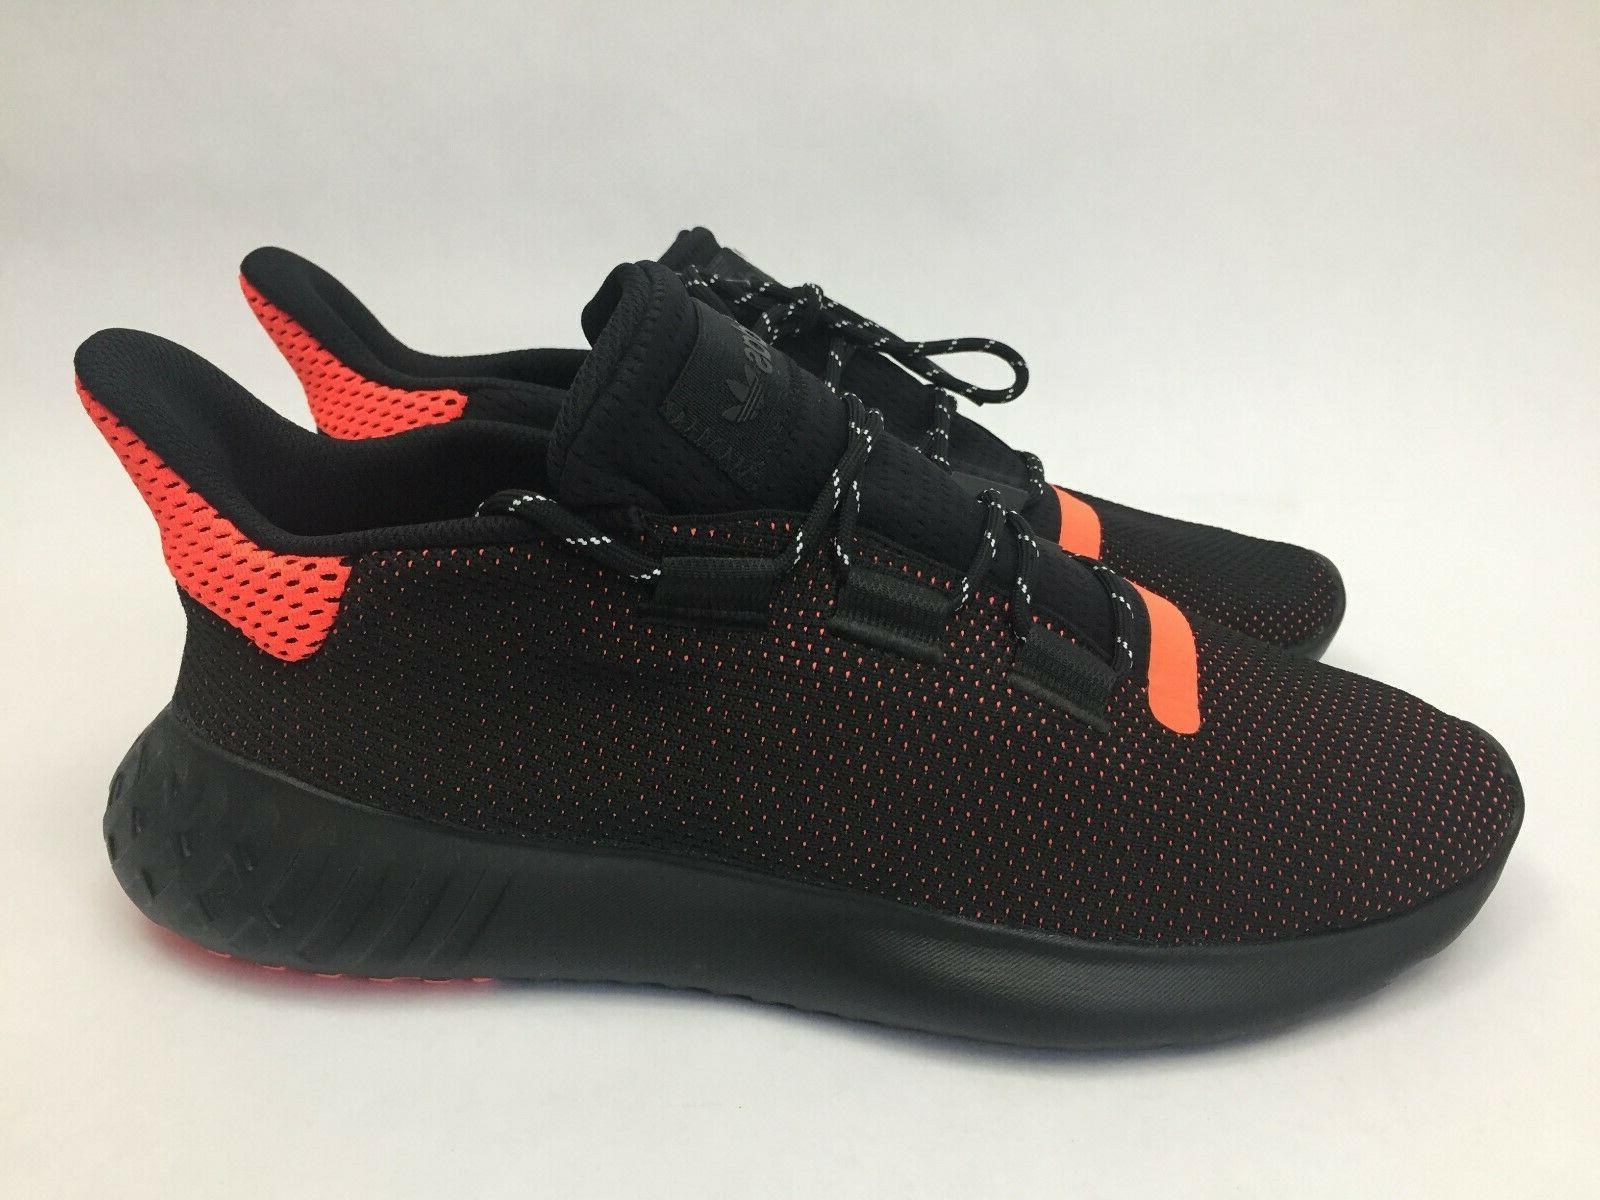 New Adidas Dusk Size 12 Black Red AQ1189